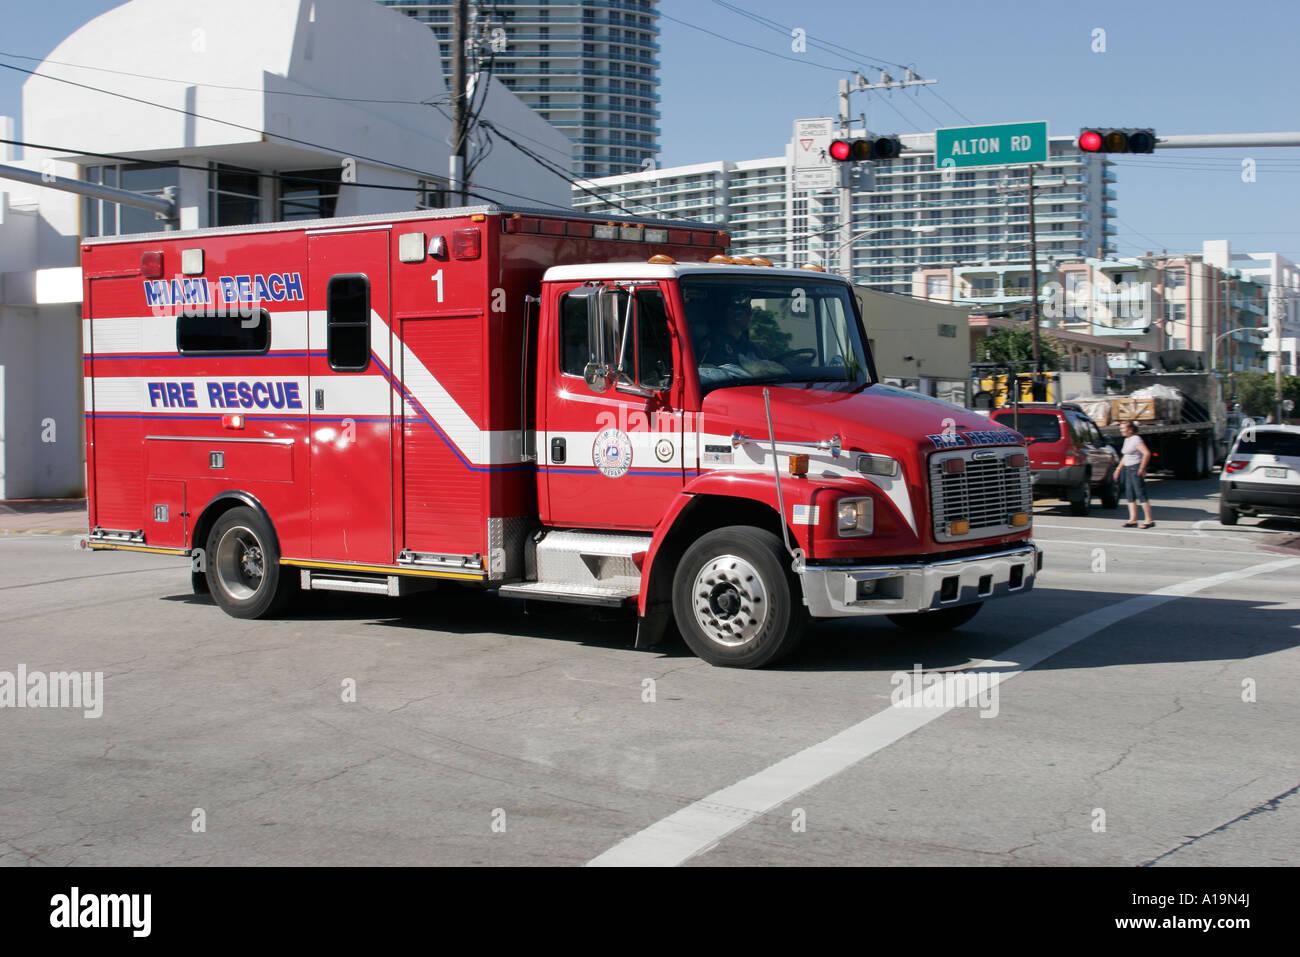 Miami Beach Medical Group Alton Road